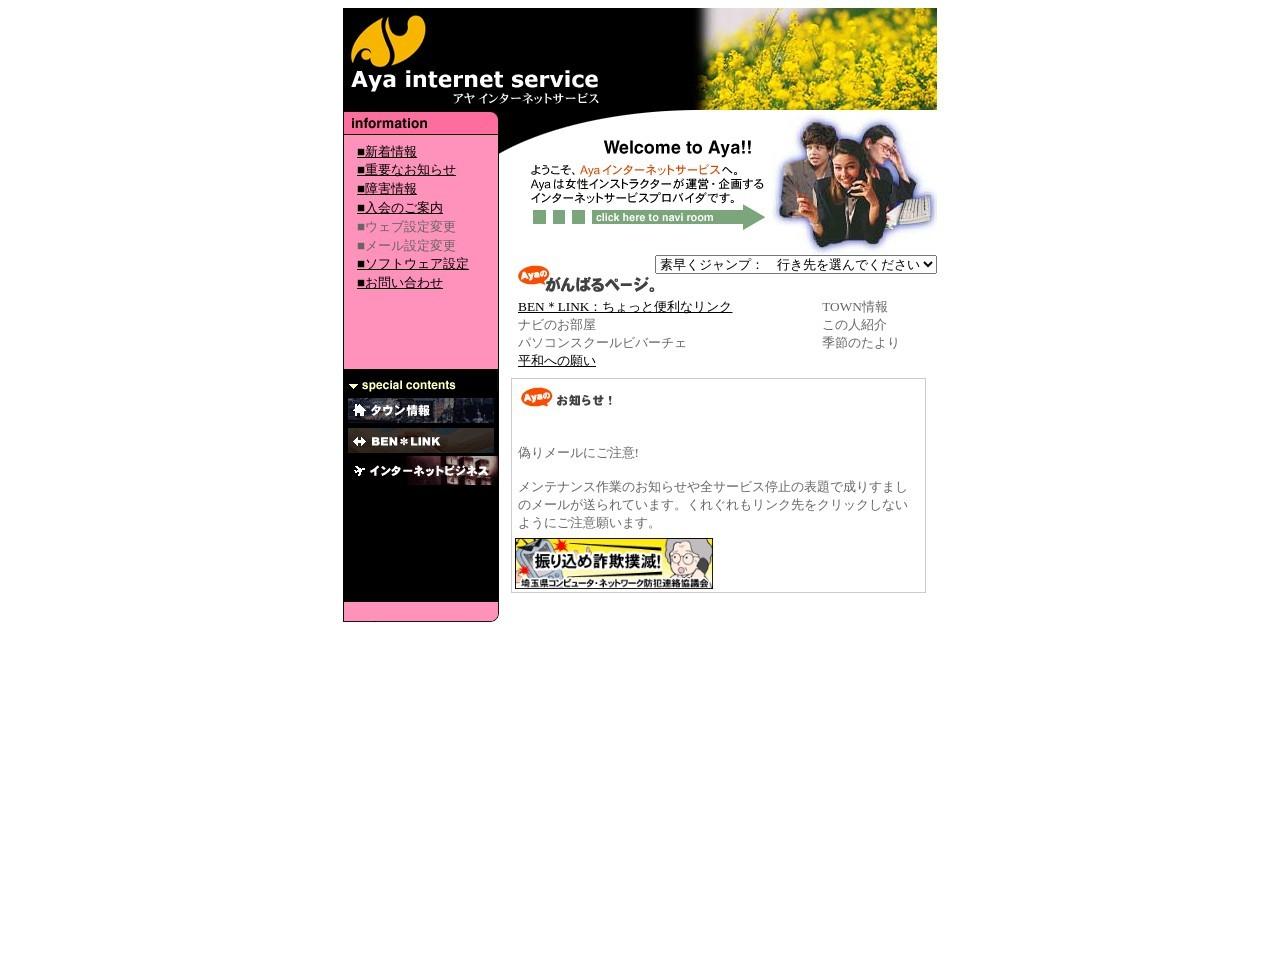 http://www.aya.or.jp/~marukimsn/